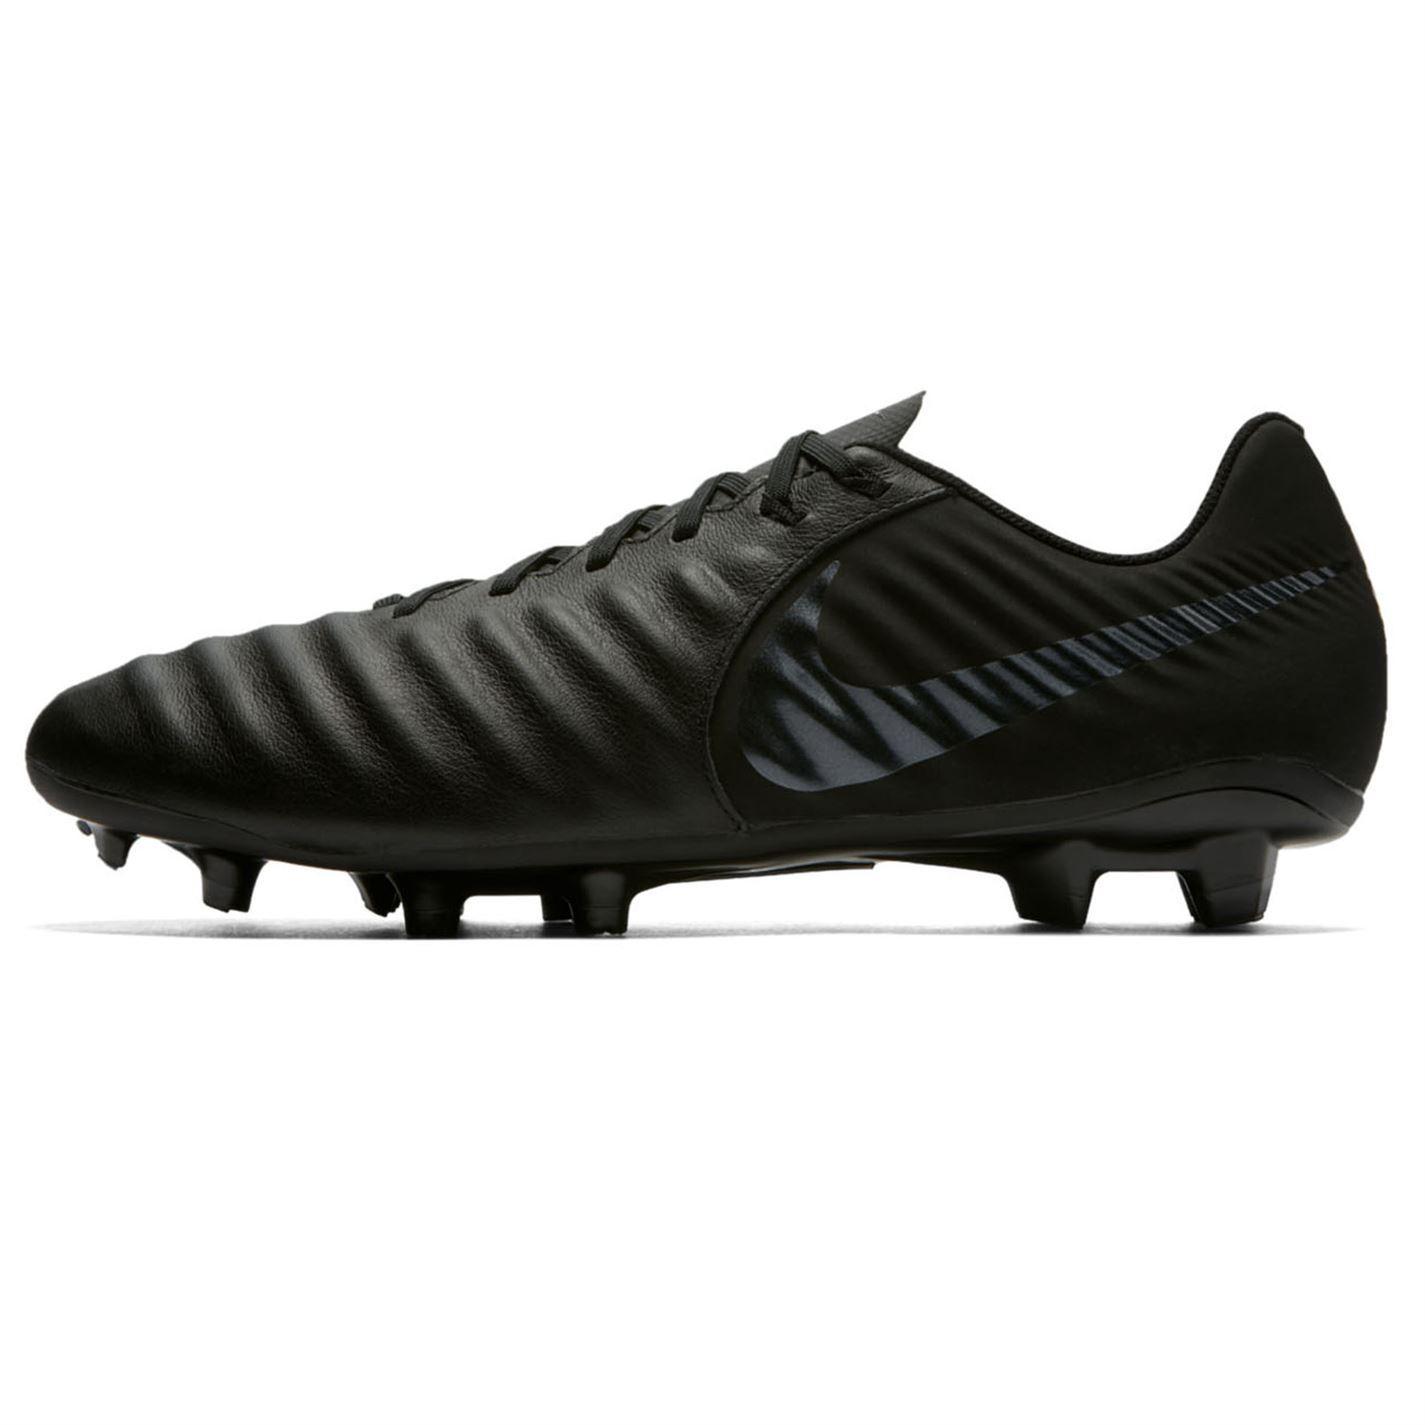 miniature 7 - Nike-Tiempo-Legend-Academy-FG-Firm-Ground-Chaussures-De-Football-Homme-Football-Chaussures-Crampons